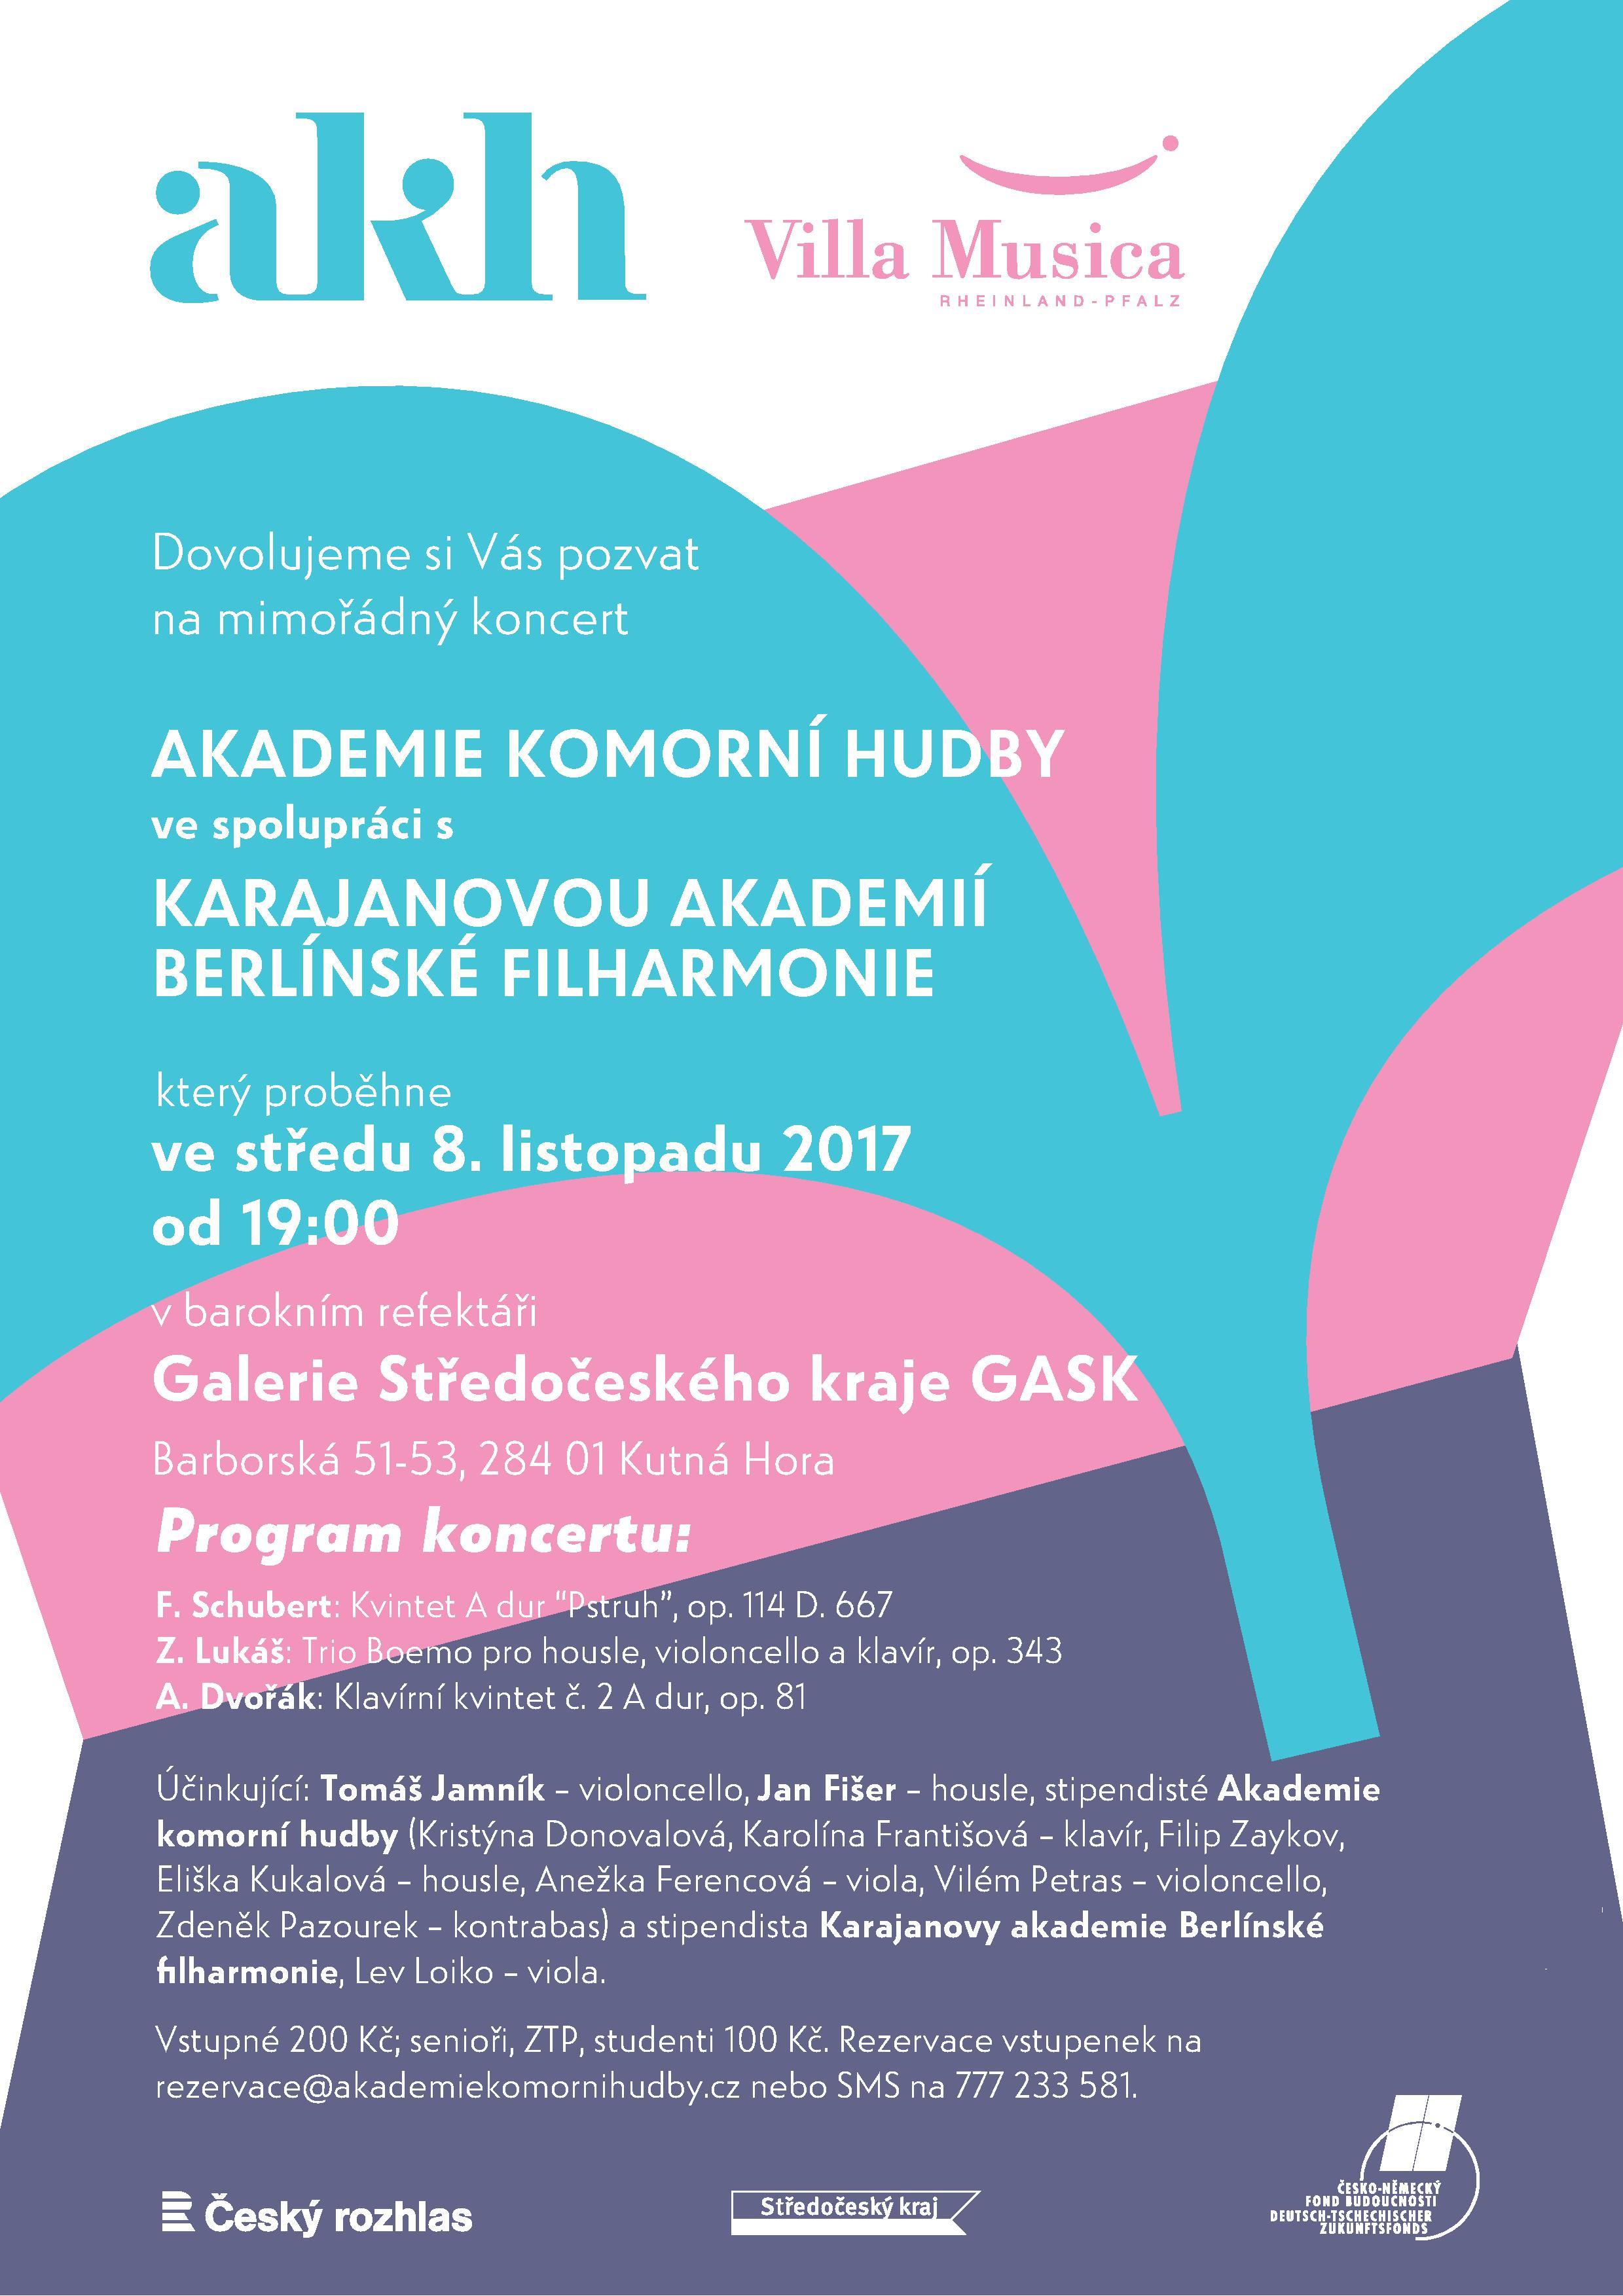 2838-akademie-komorni-hudby-8-11-gask.jpg